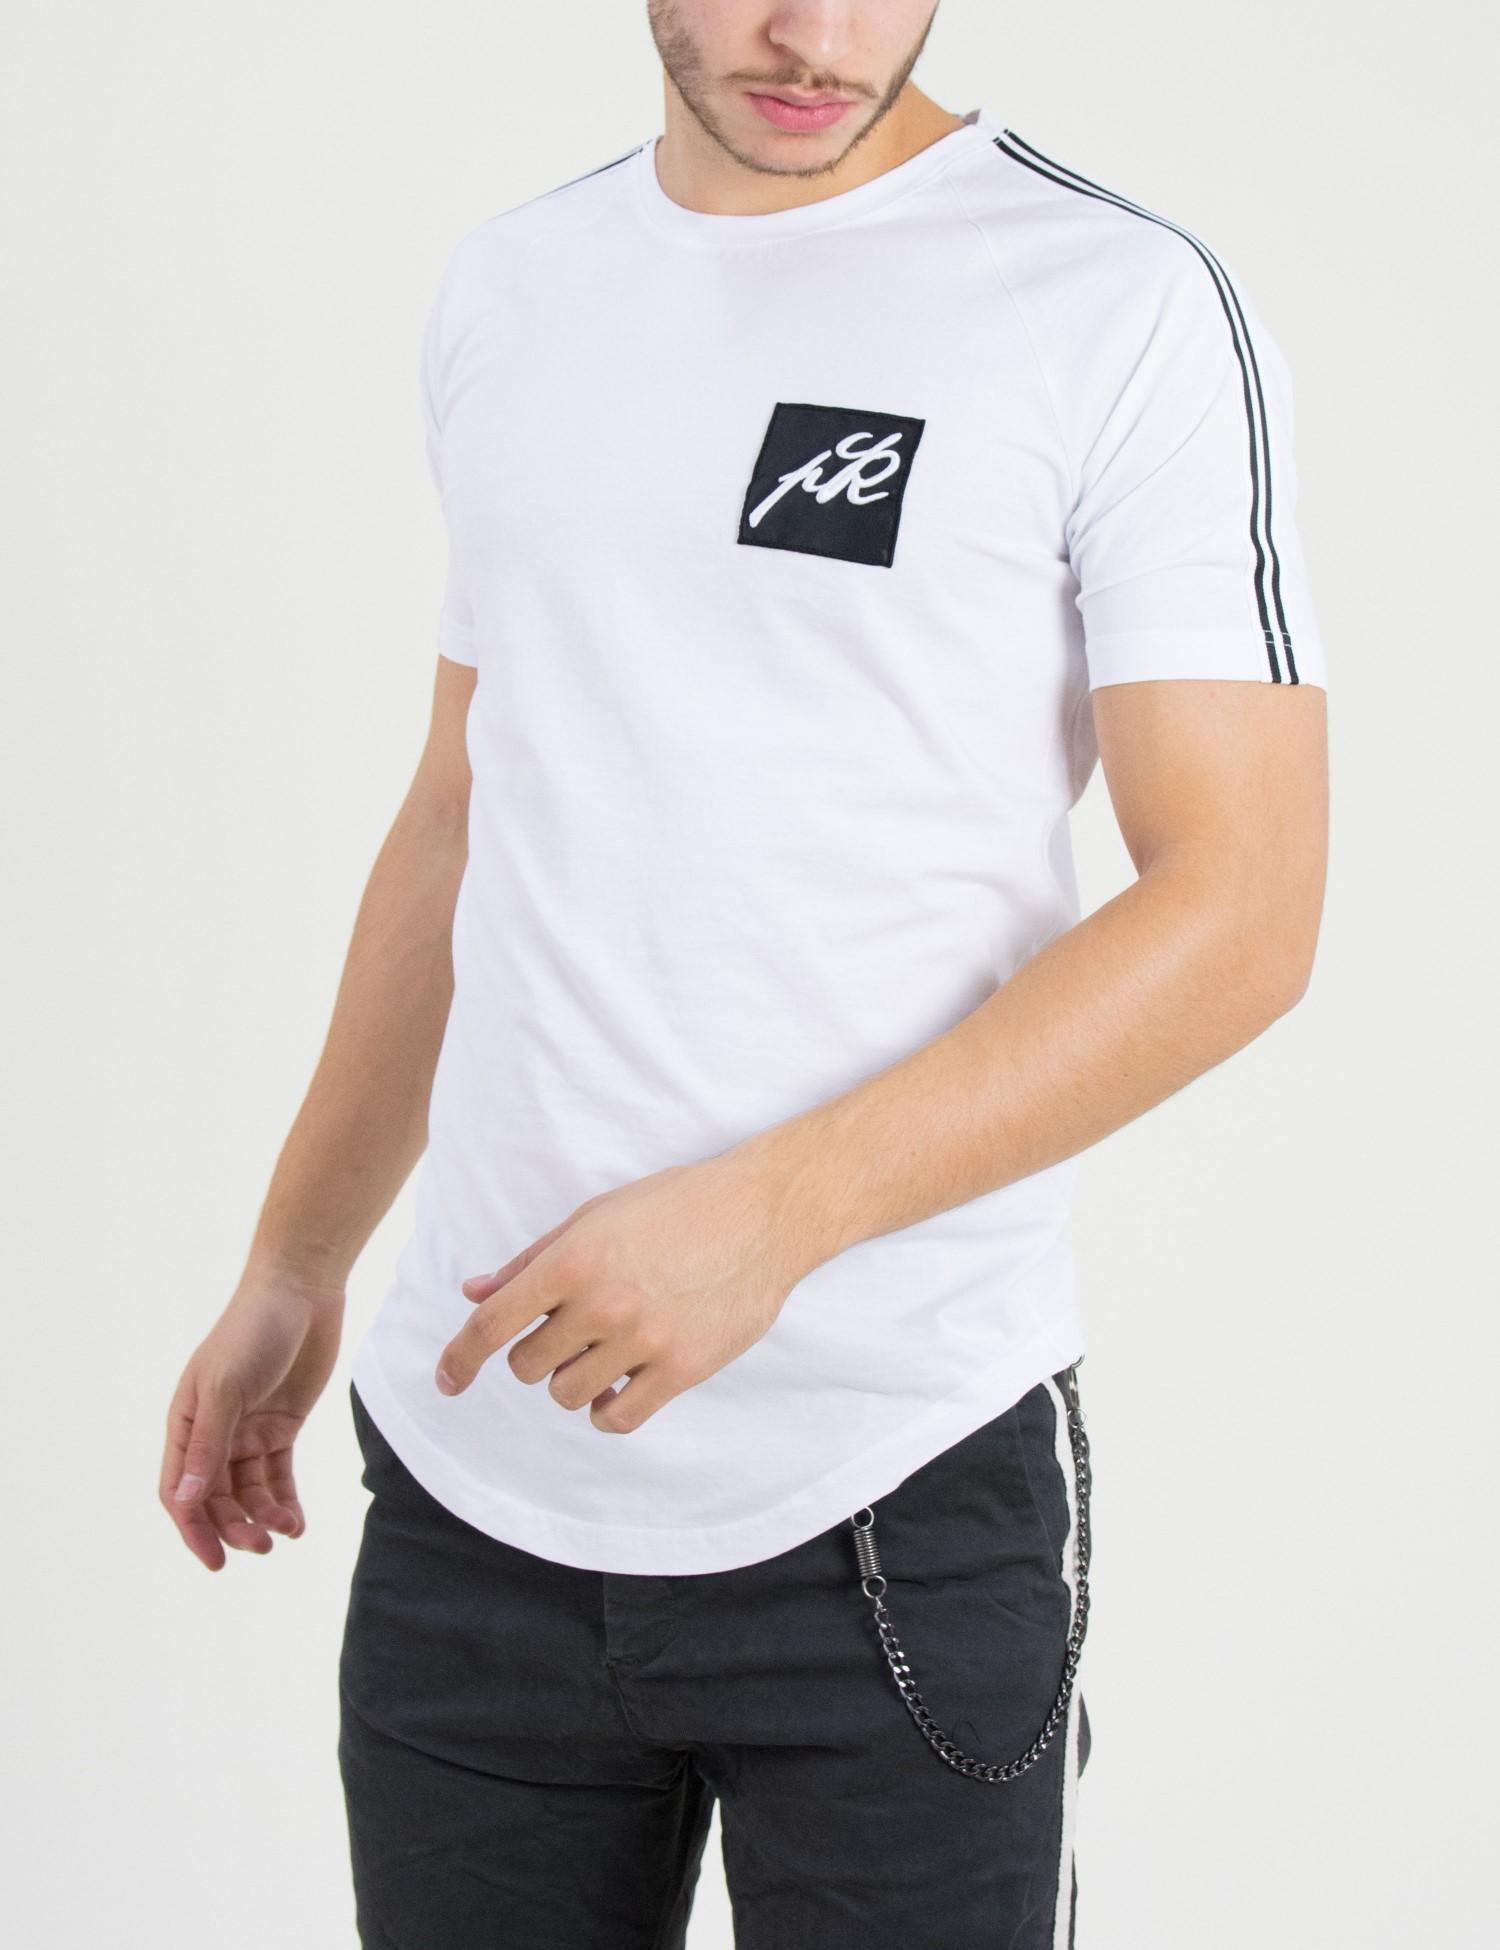 1ec3be2b2e0c Ανδρική λευκή με ρίγα κοντομάνικη μπλούζα Ponte Rosso 182032